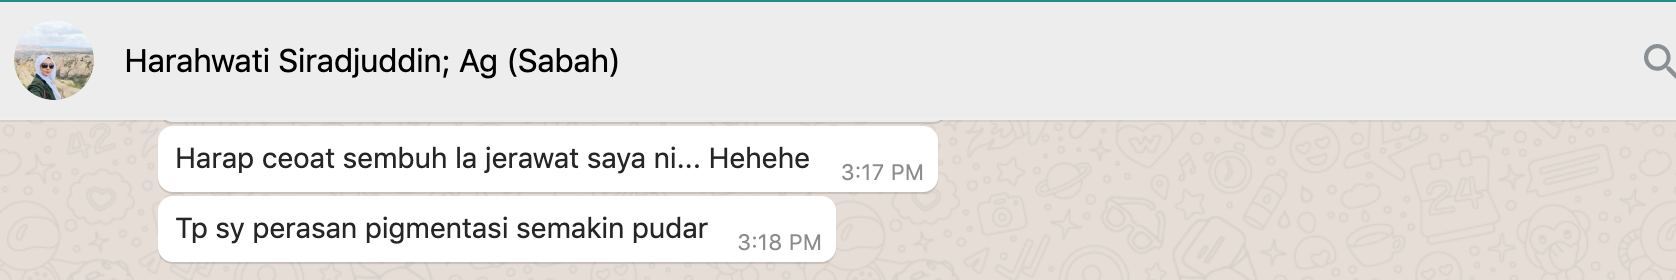 Harahwati Siradjuddin, 30  